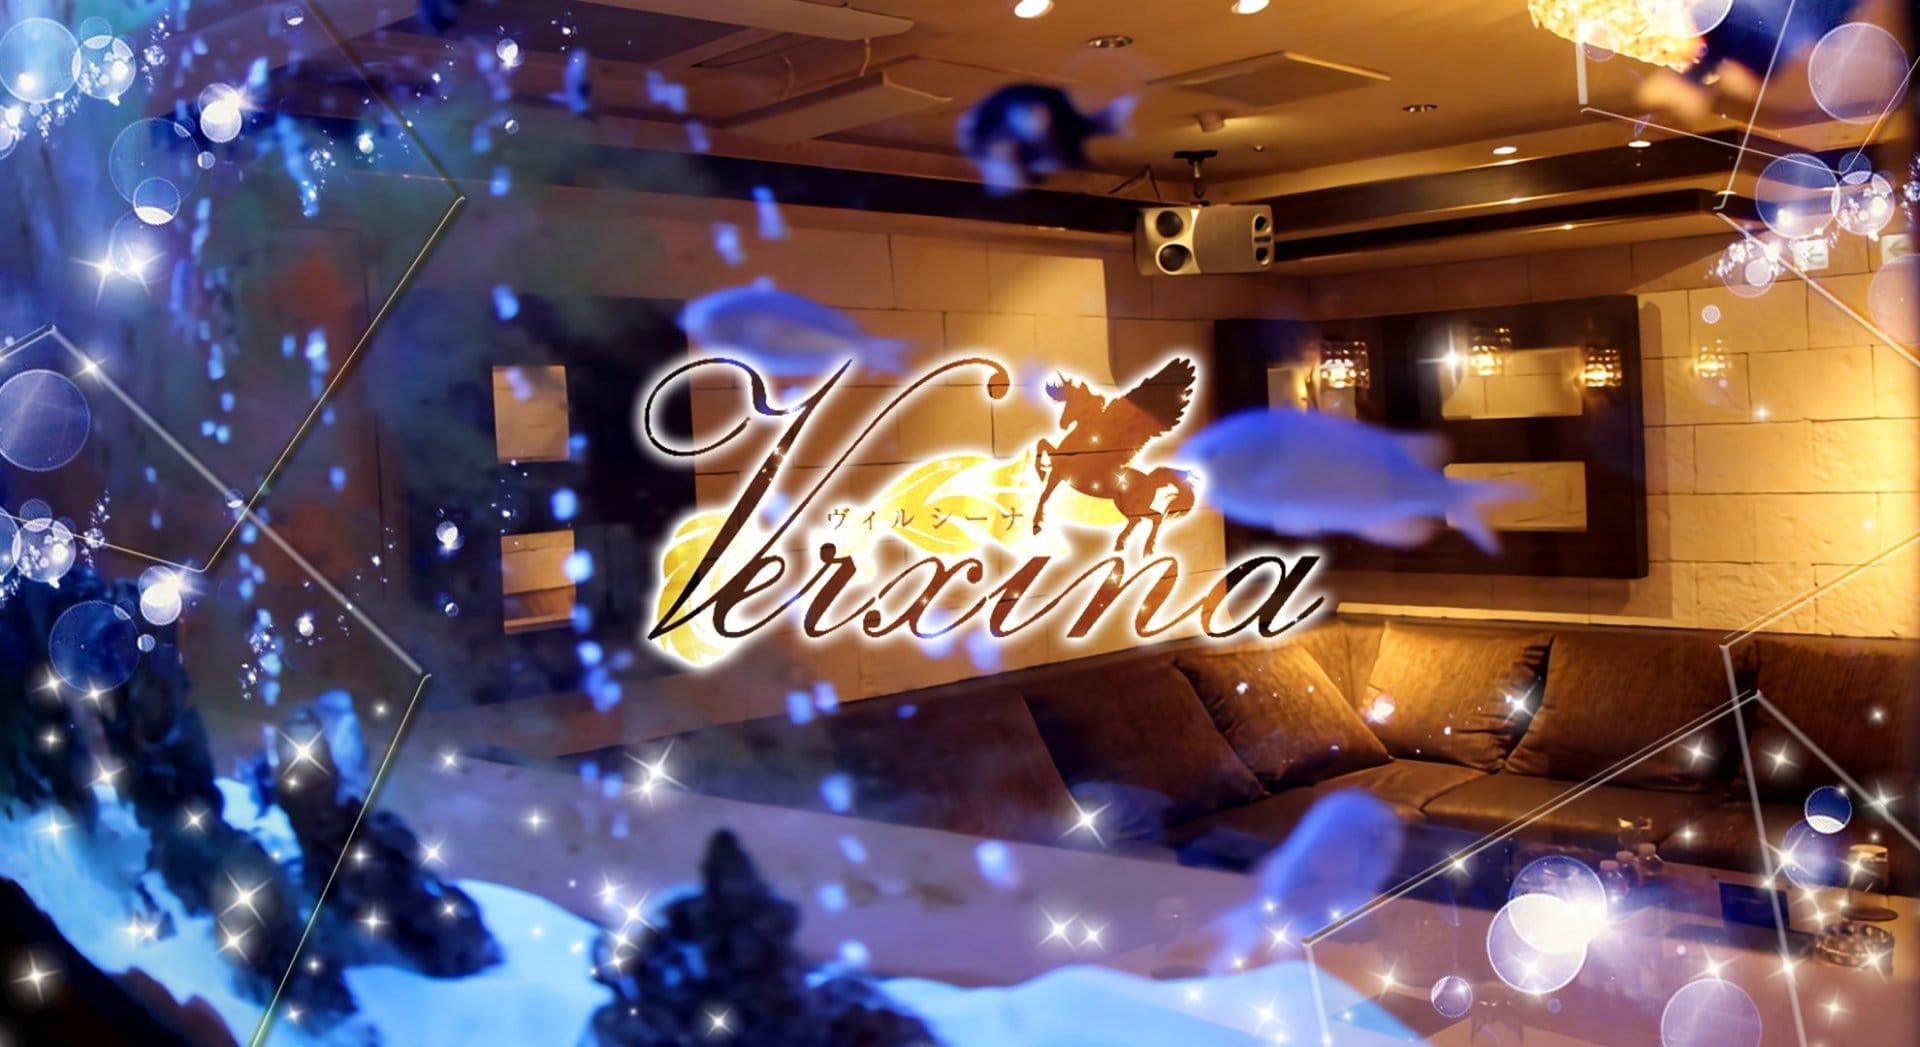 VERXINA(ヴィルシーナ) TOP画像